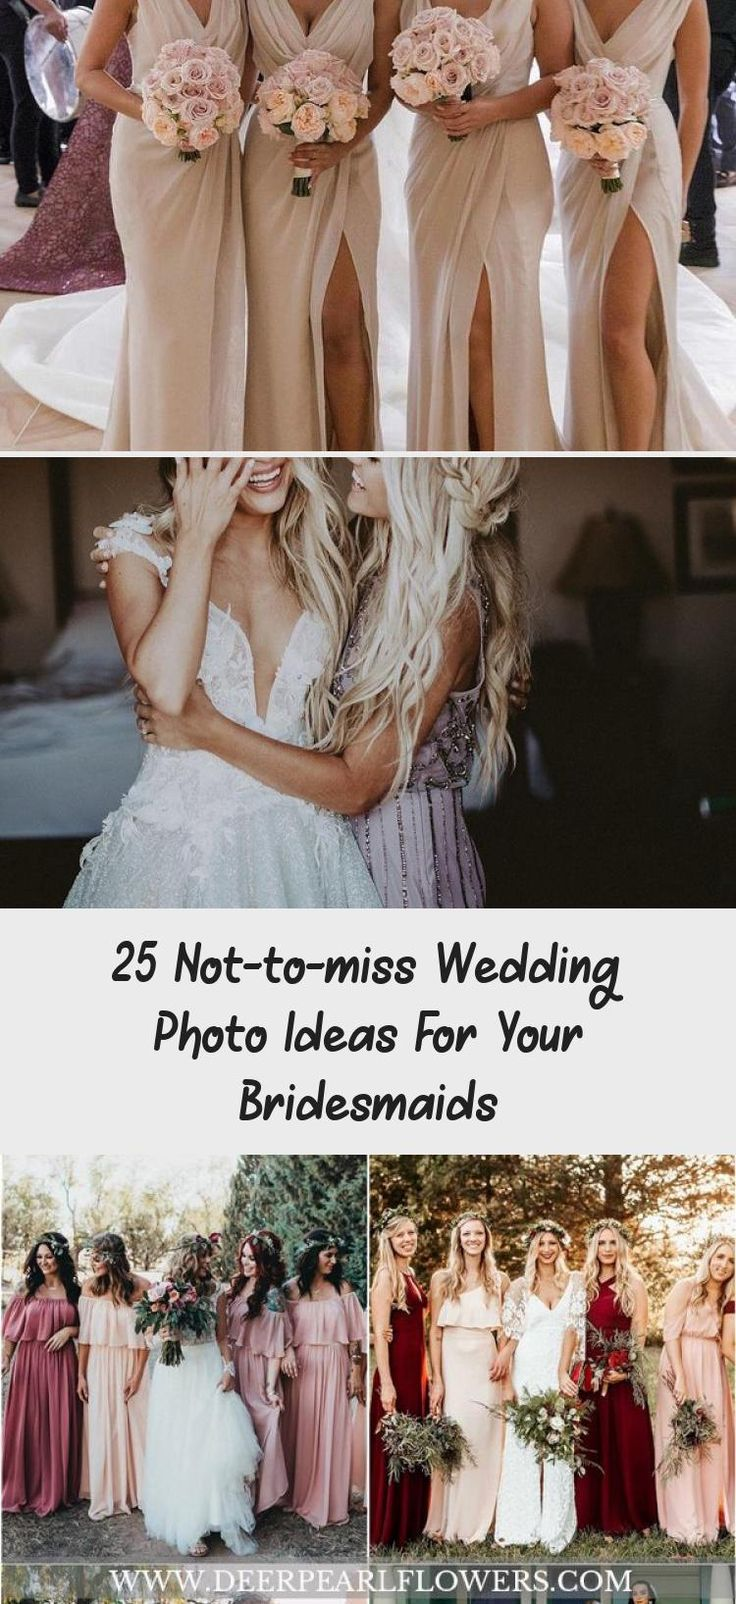 Wedding Photo Ideas For Your Bridesmaids  #wedding #weddingideas #weddingphotos #deerpearlflowers #BridesmaidDressesFall #ModestBridesmaidDresses #BridesmaidDressesSummer #BridesmaidDressesCoral #BridesmaidDressesBoho